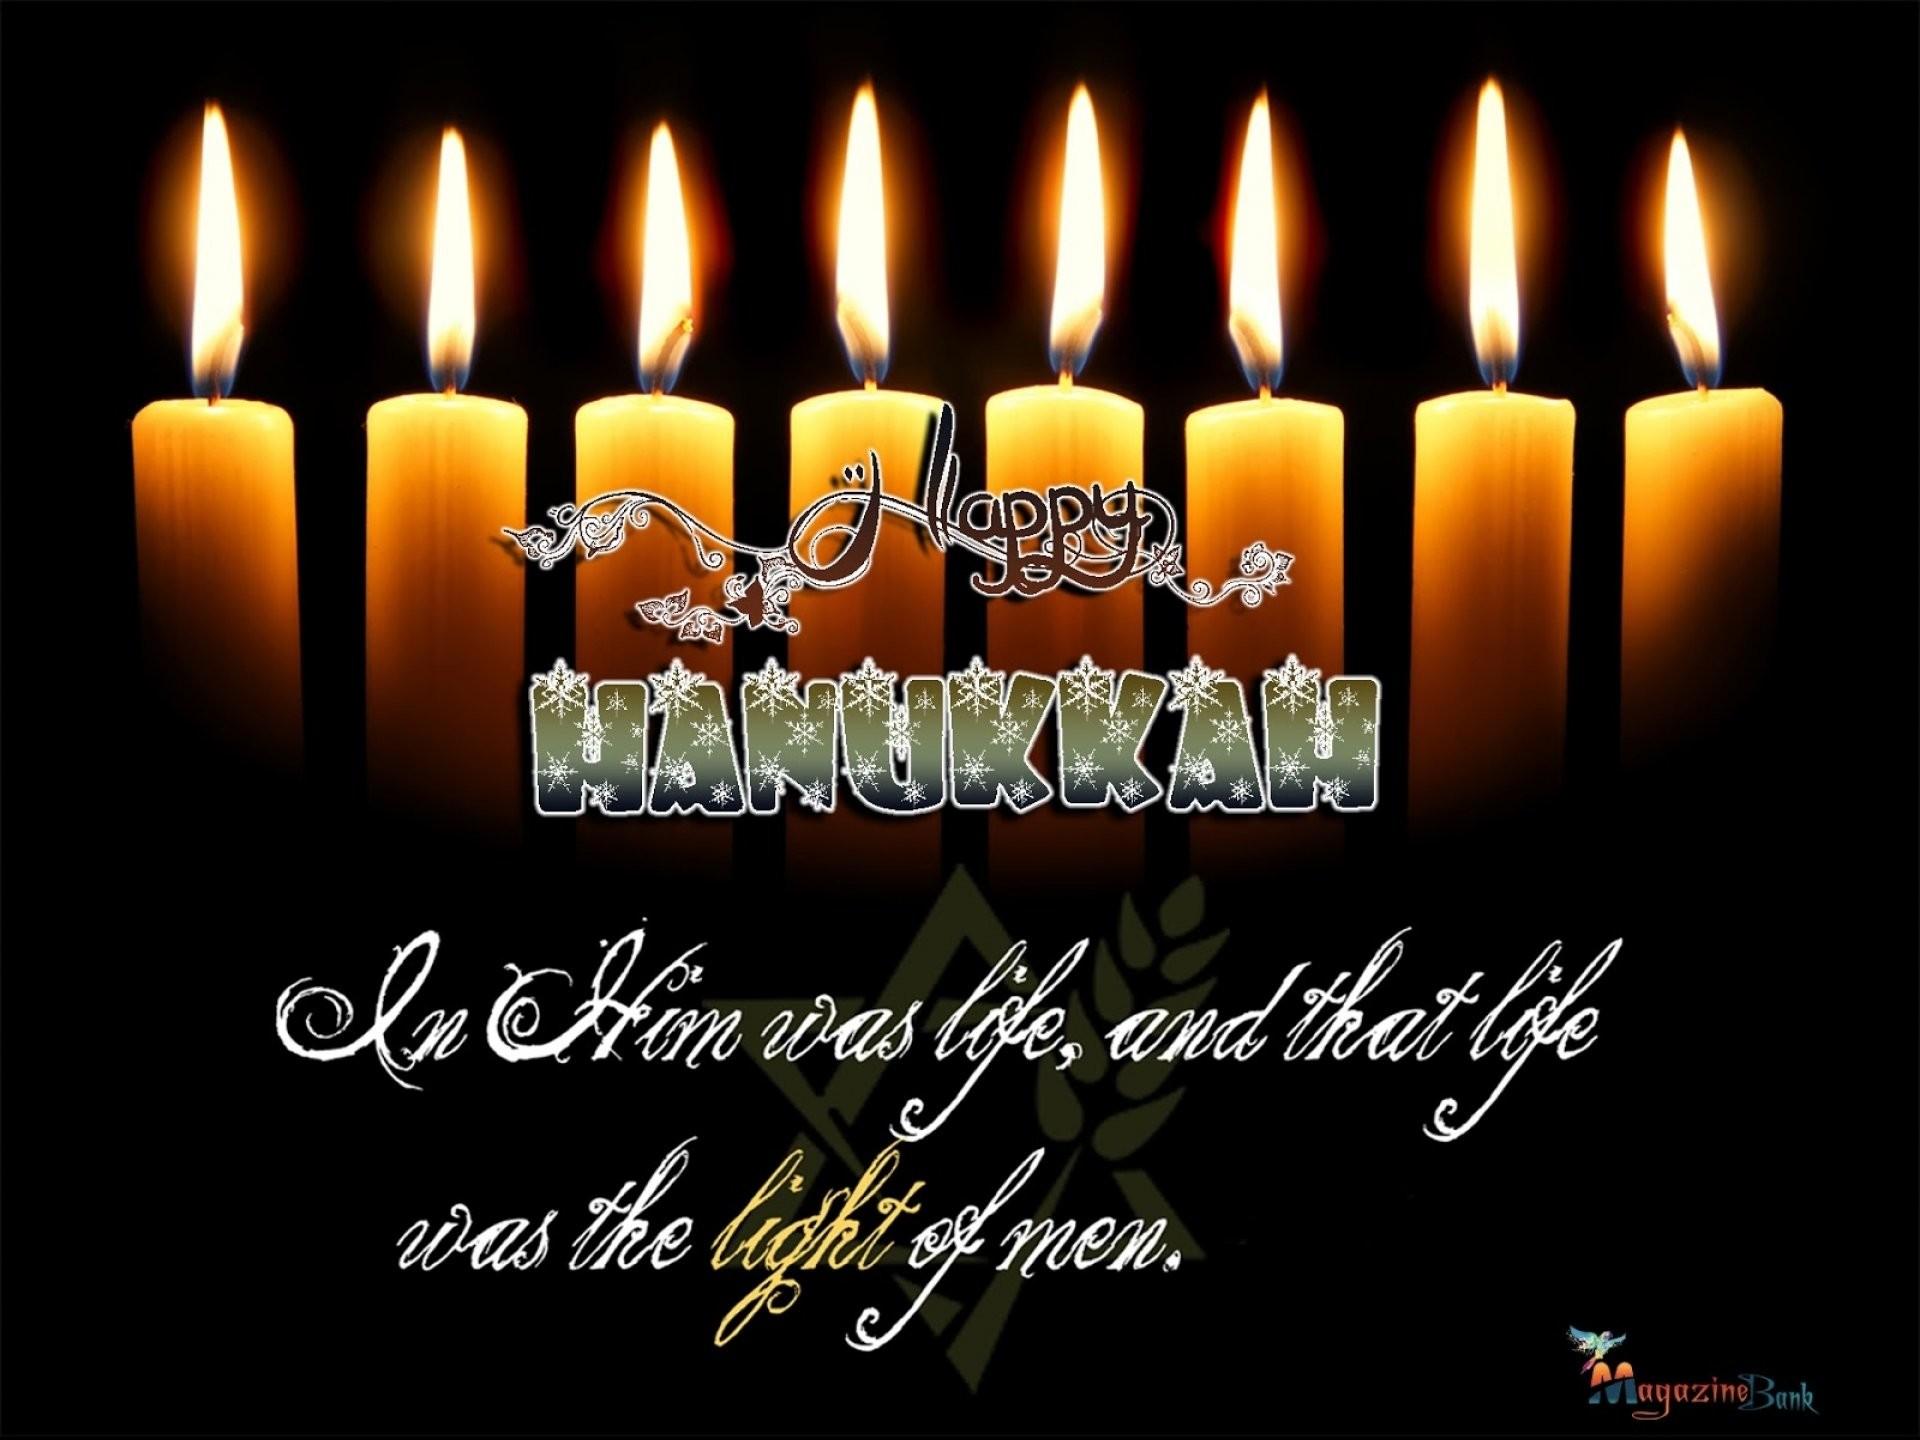 HANUKKAH jewish festival holiday candelabrum candle menorah hanukiah  Chanukah wallpaper     555271   WallpaperUP